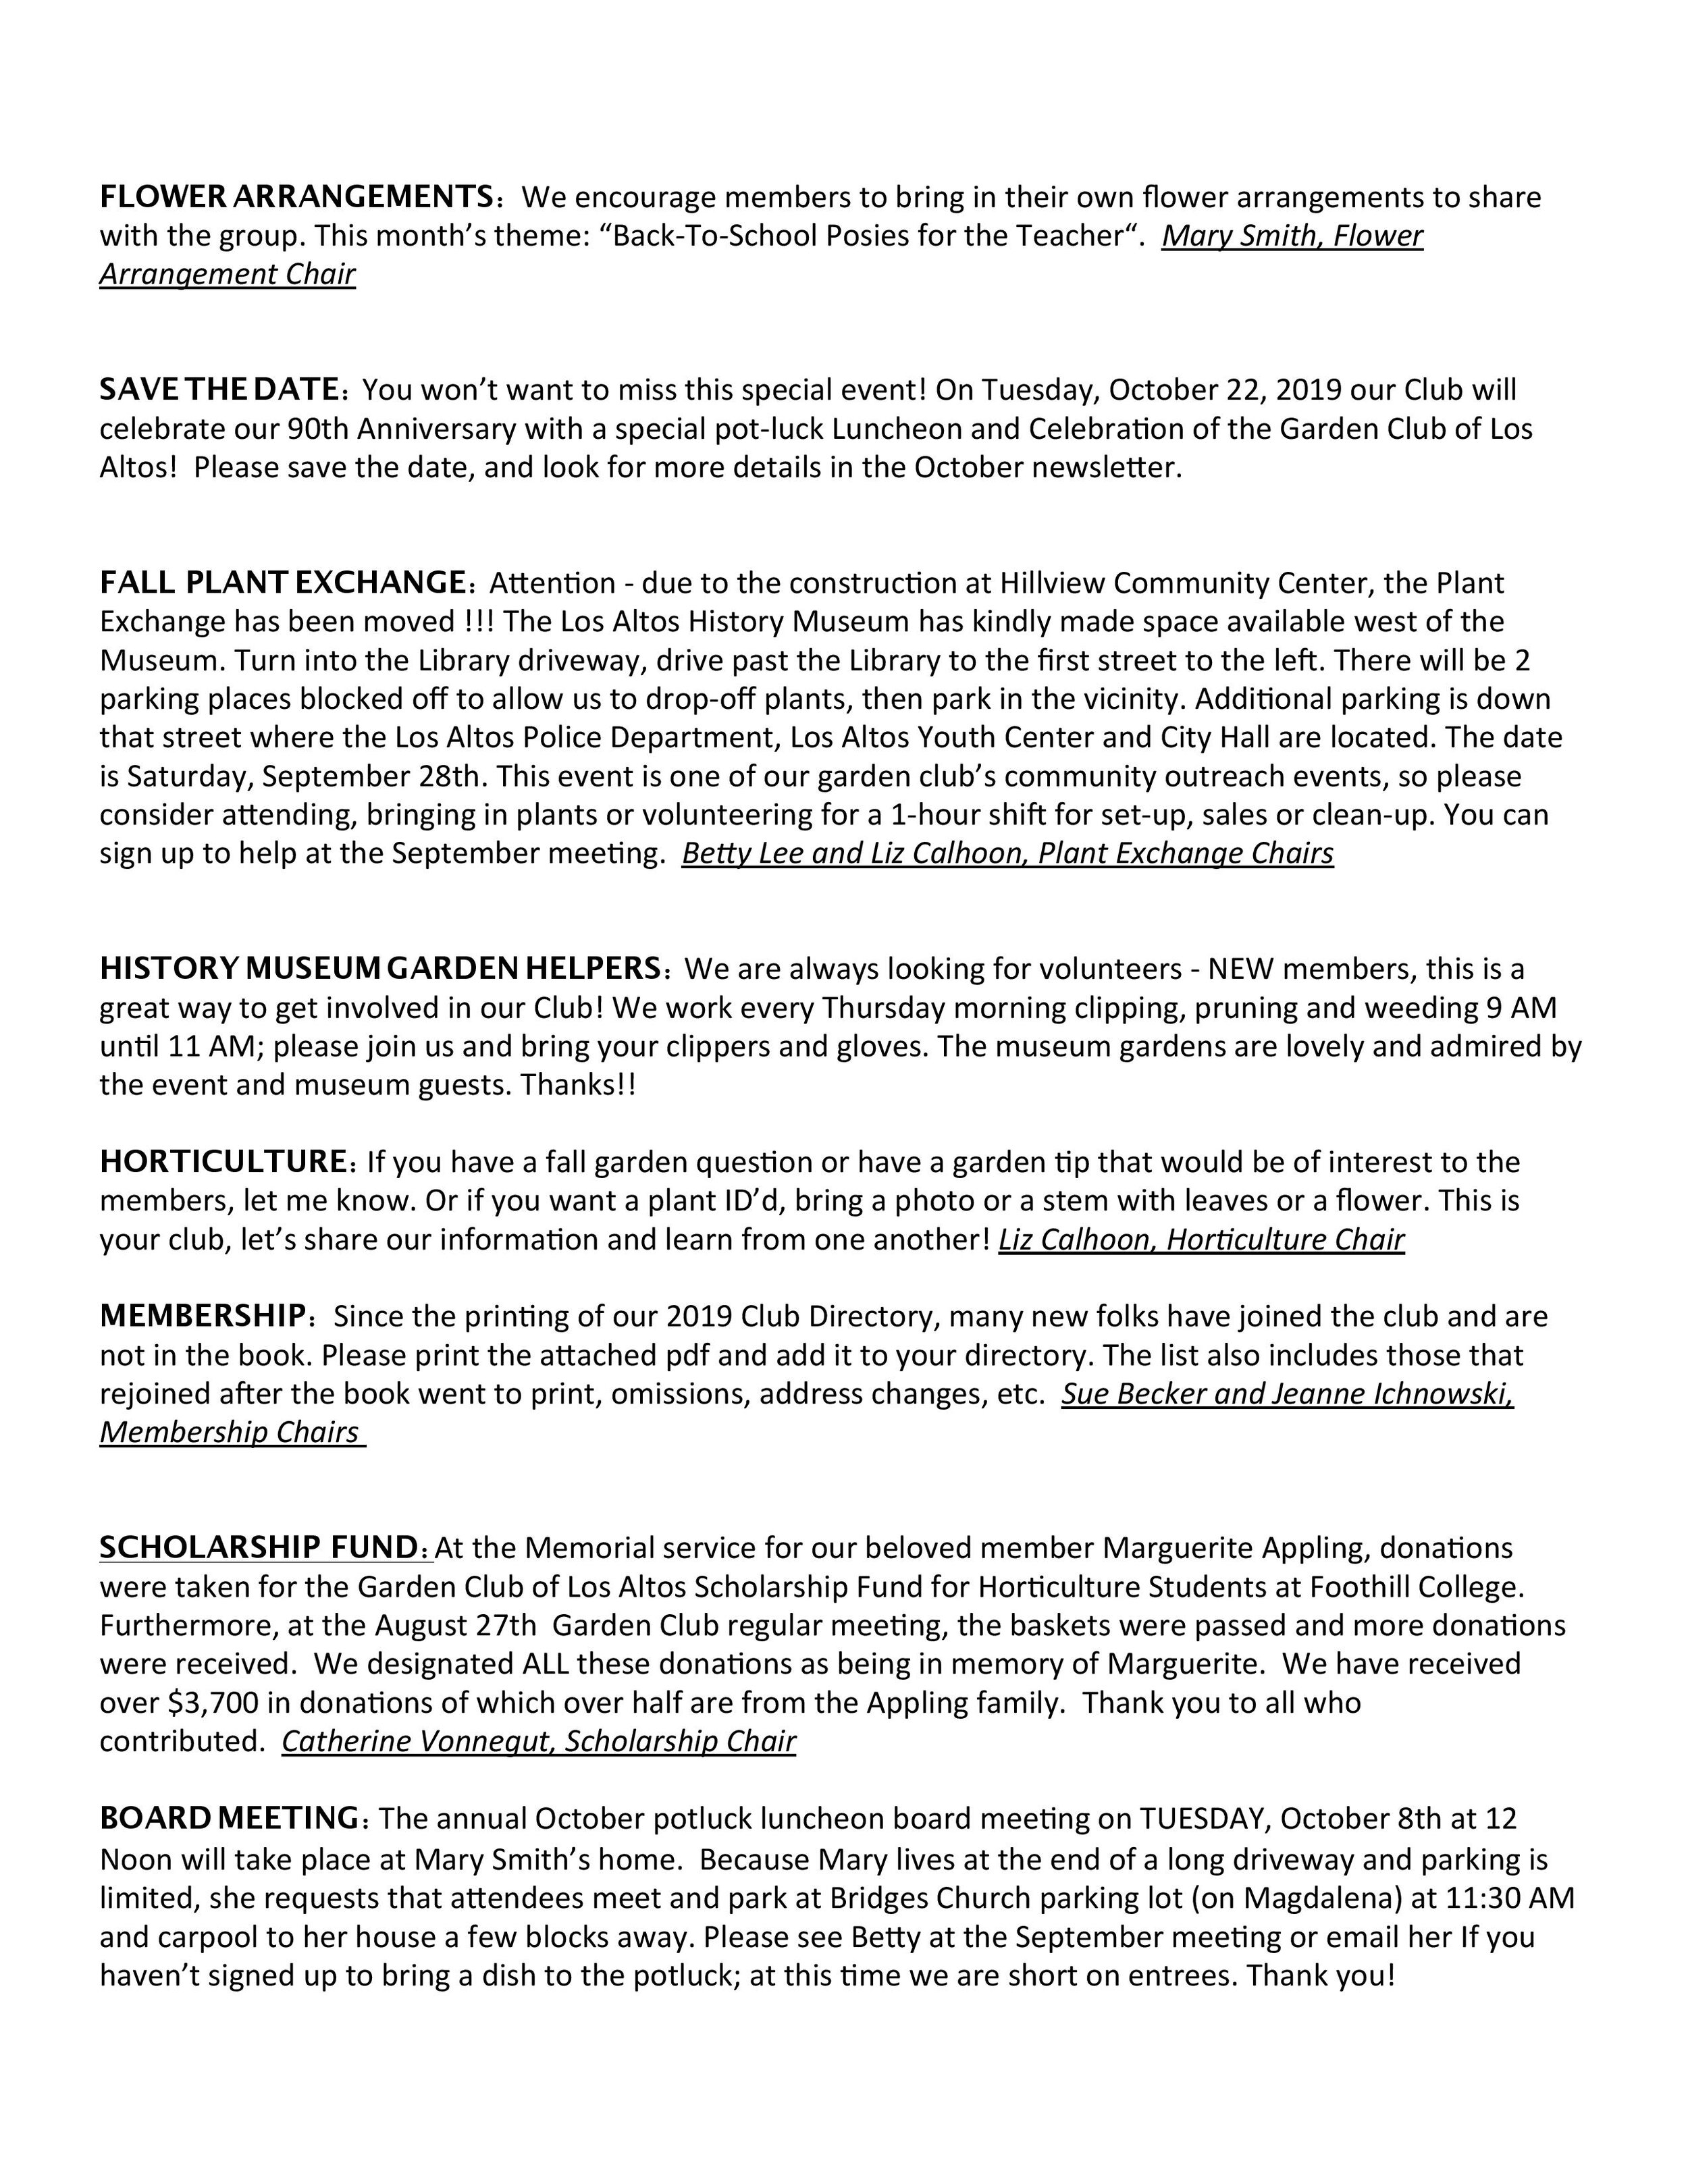 gardenclubnewssept copy-page-002.jpg